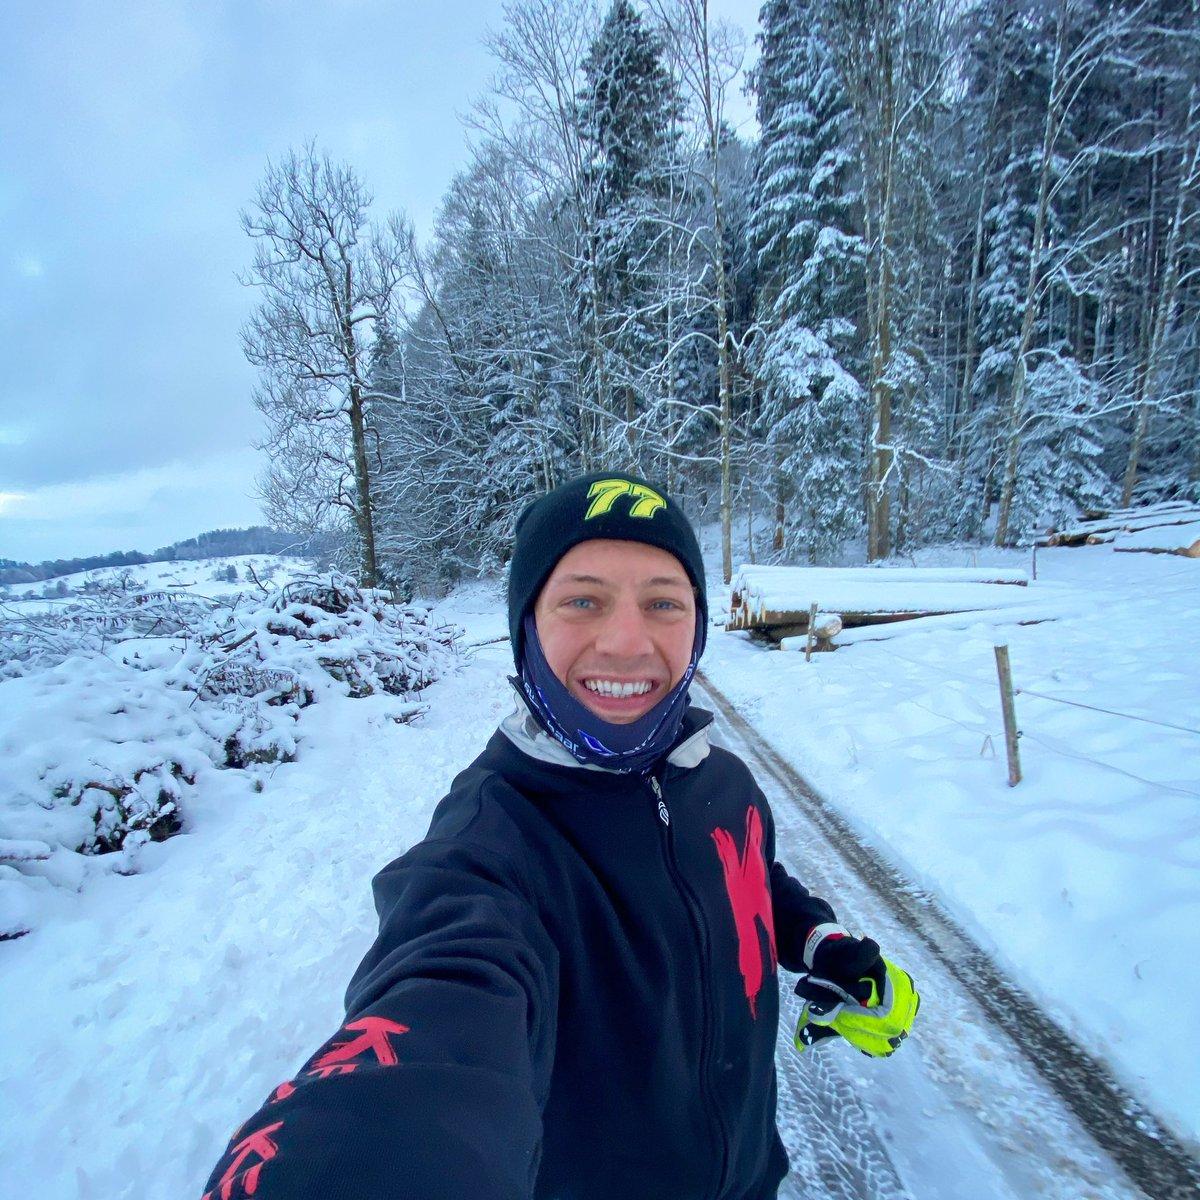 Winter wonderland  🇨🇭❄️⛄️ 🏃♂️   #home #run #running #selfie #smile #winterwonderland #friday #mood #snow #cold #swiss #switzerland #happy #training #hard #domi77 #ad77 #aegi77 #livefullgas #77 #domifighter